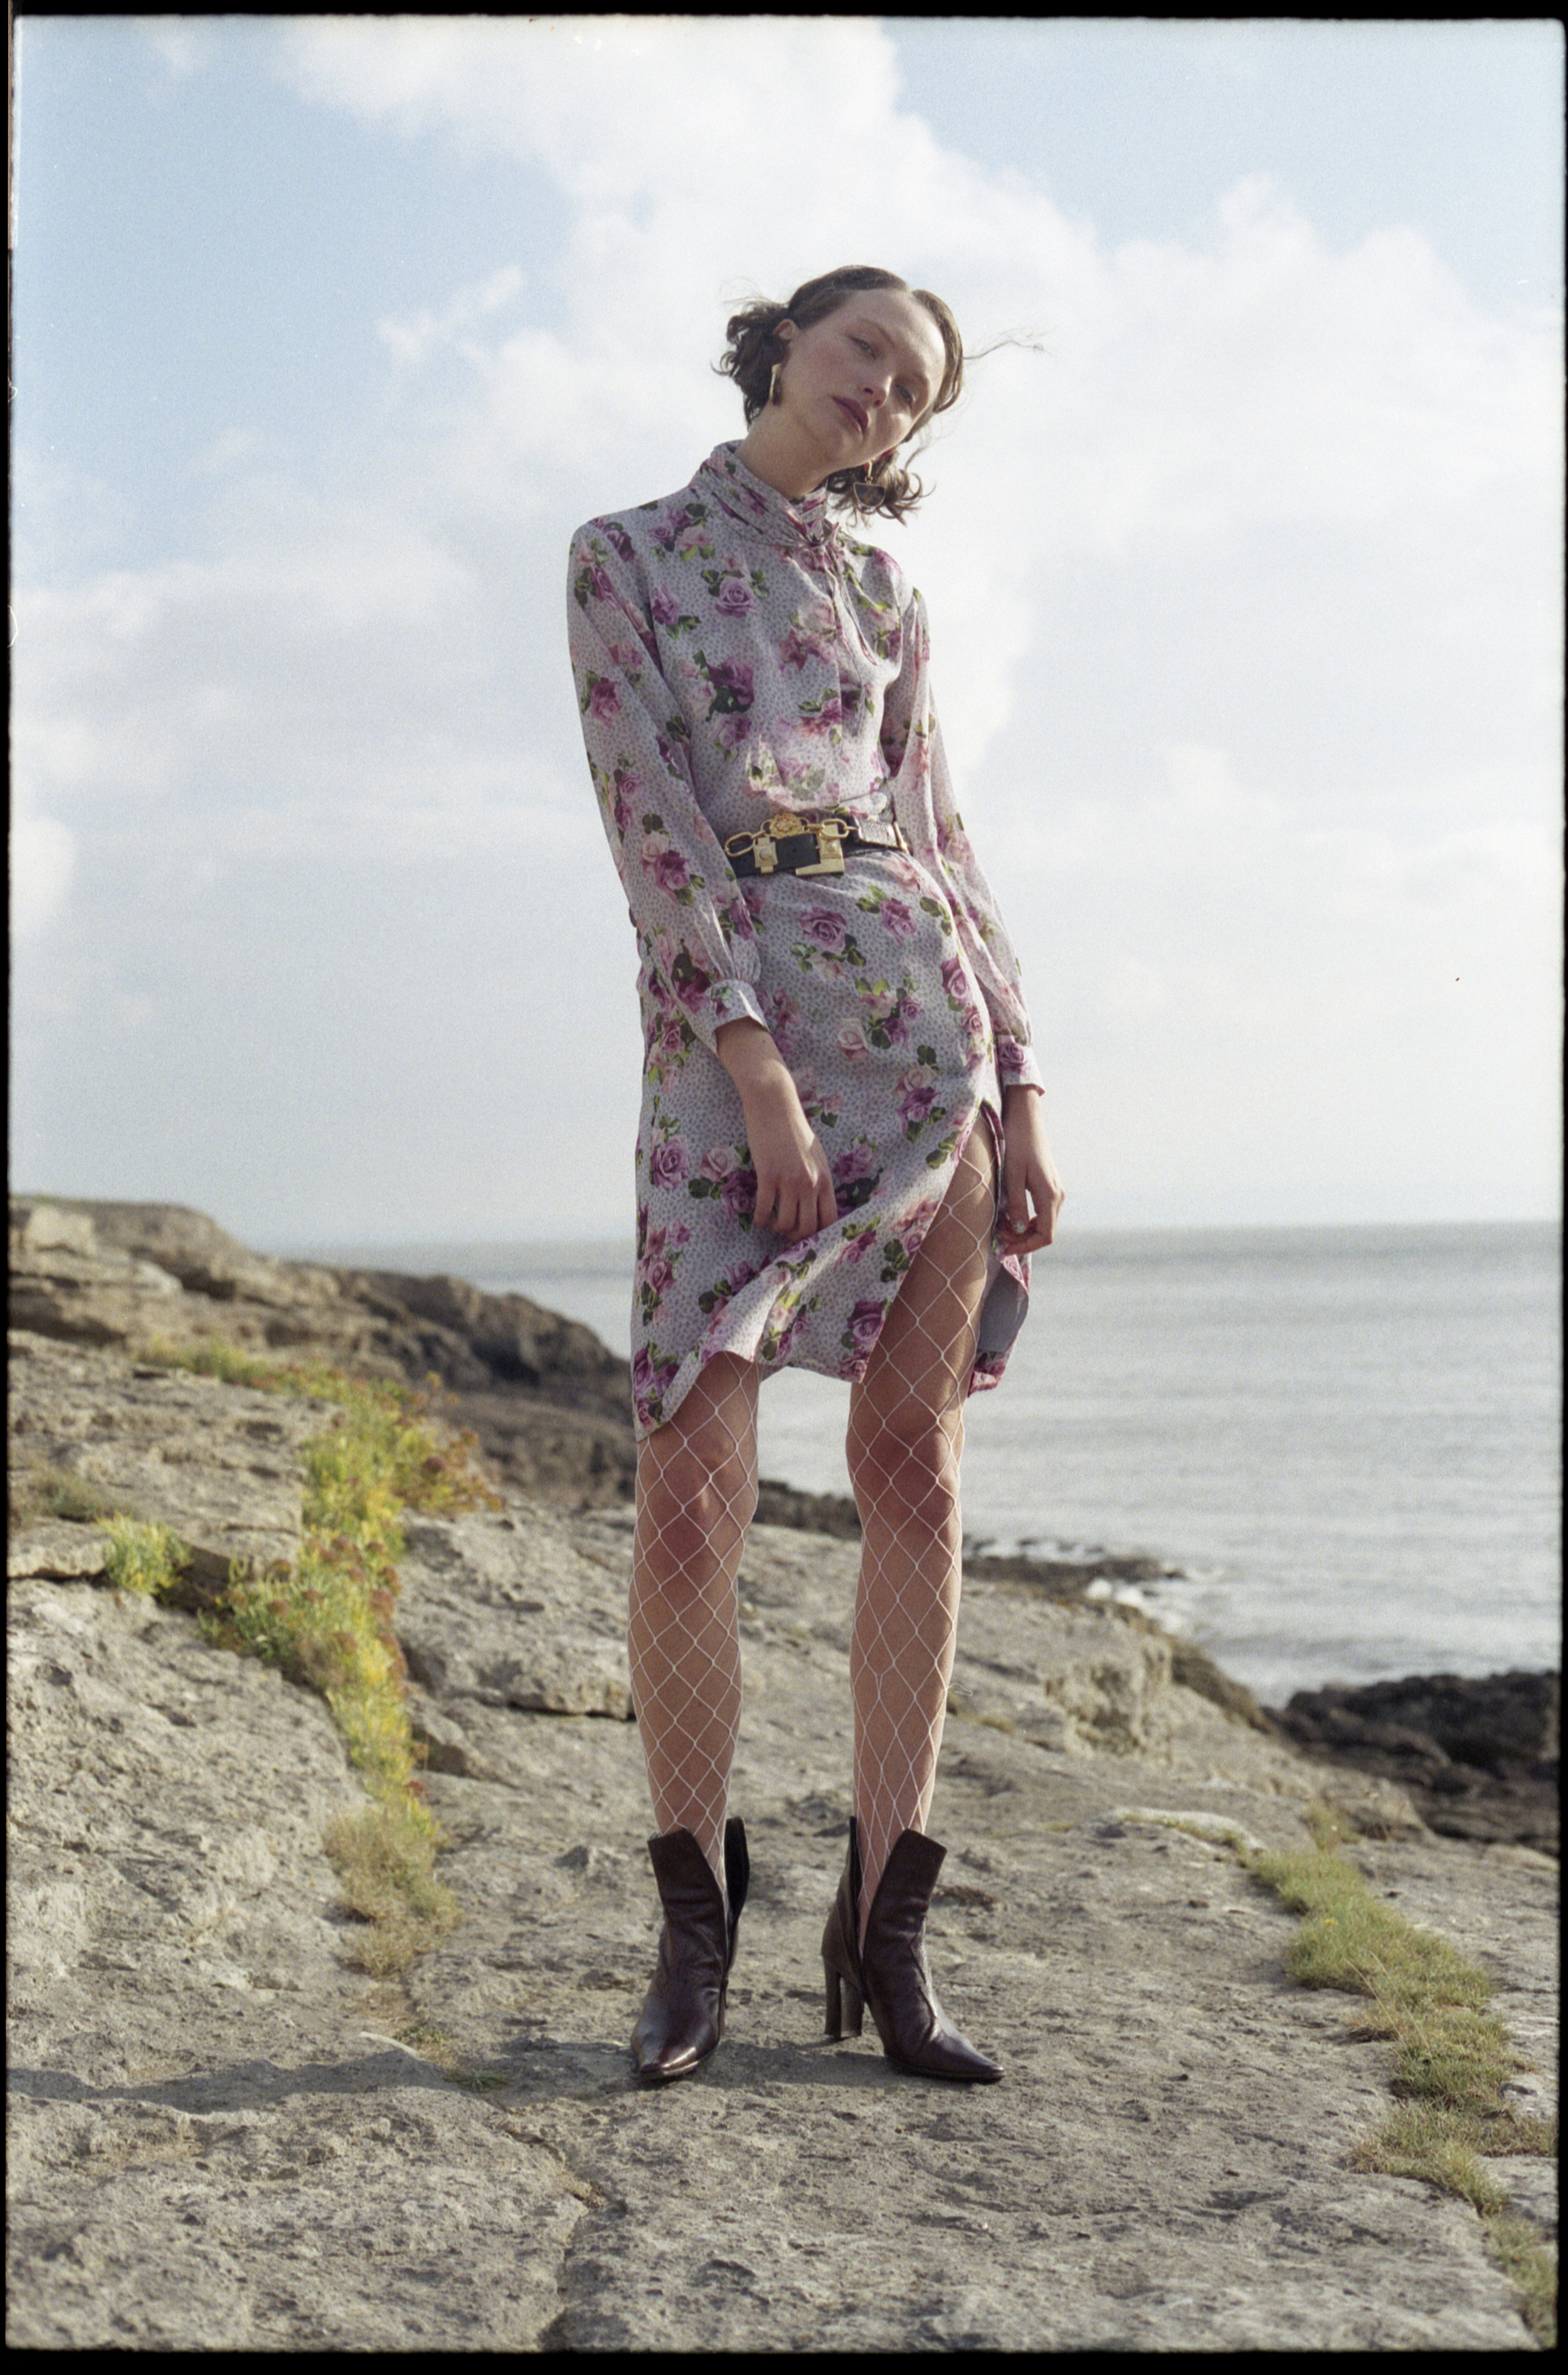 dress  TOPSHOP UNIQUE , belts + boots VINTAGE, earrings  TOPSHOP , fishnet tights STYLIST'S OWN